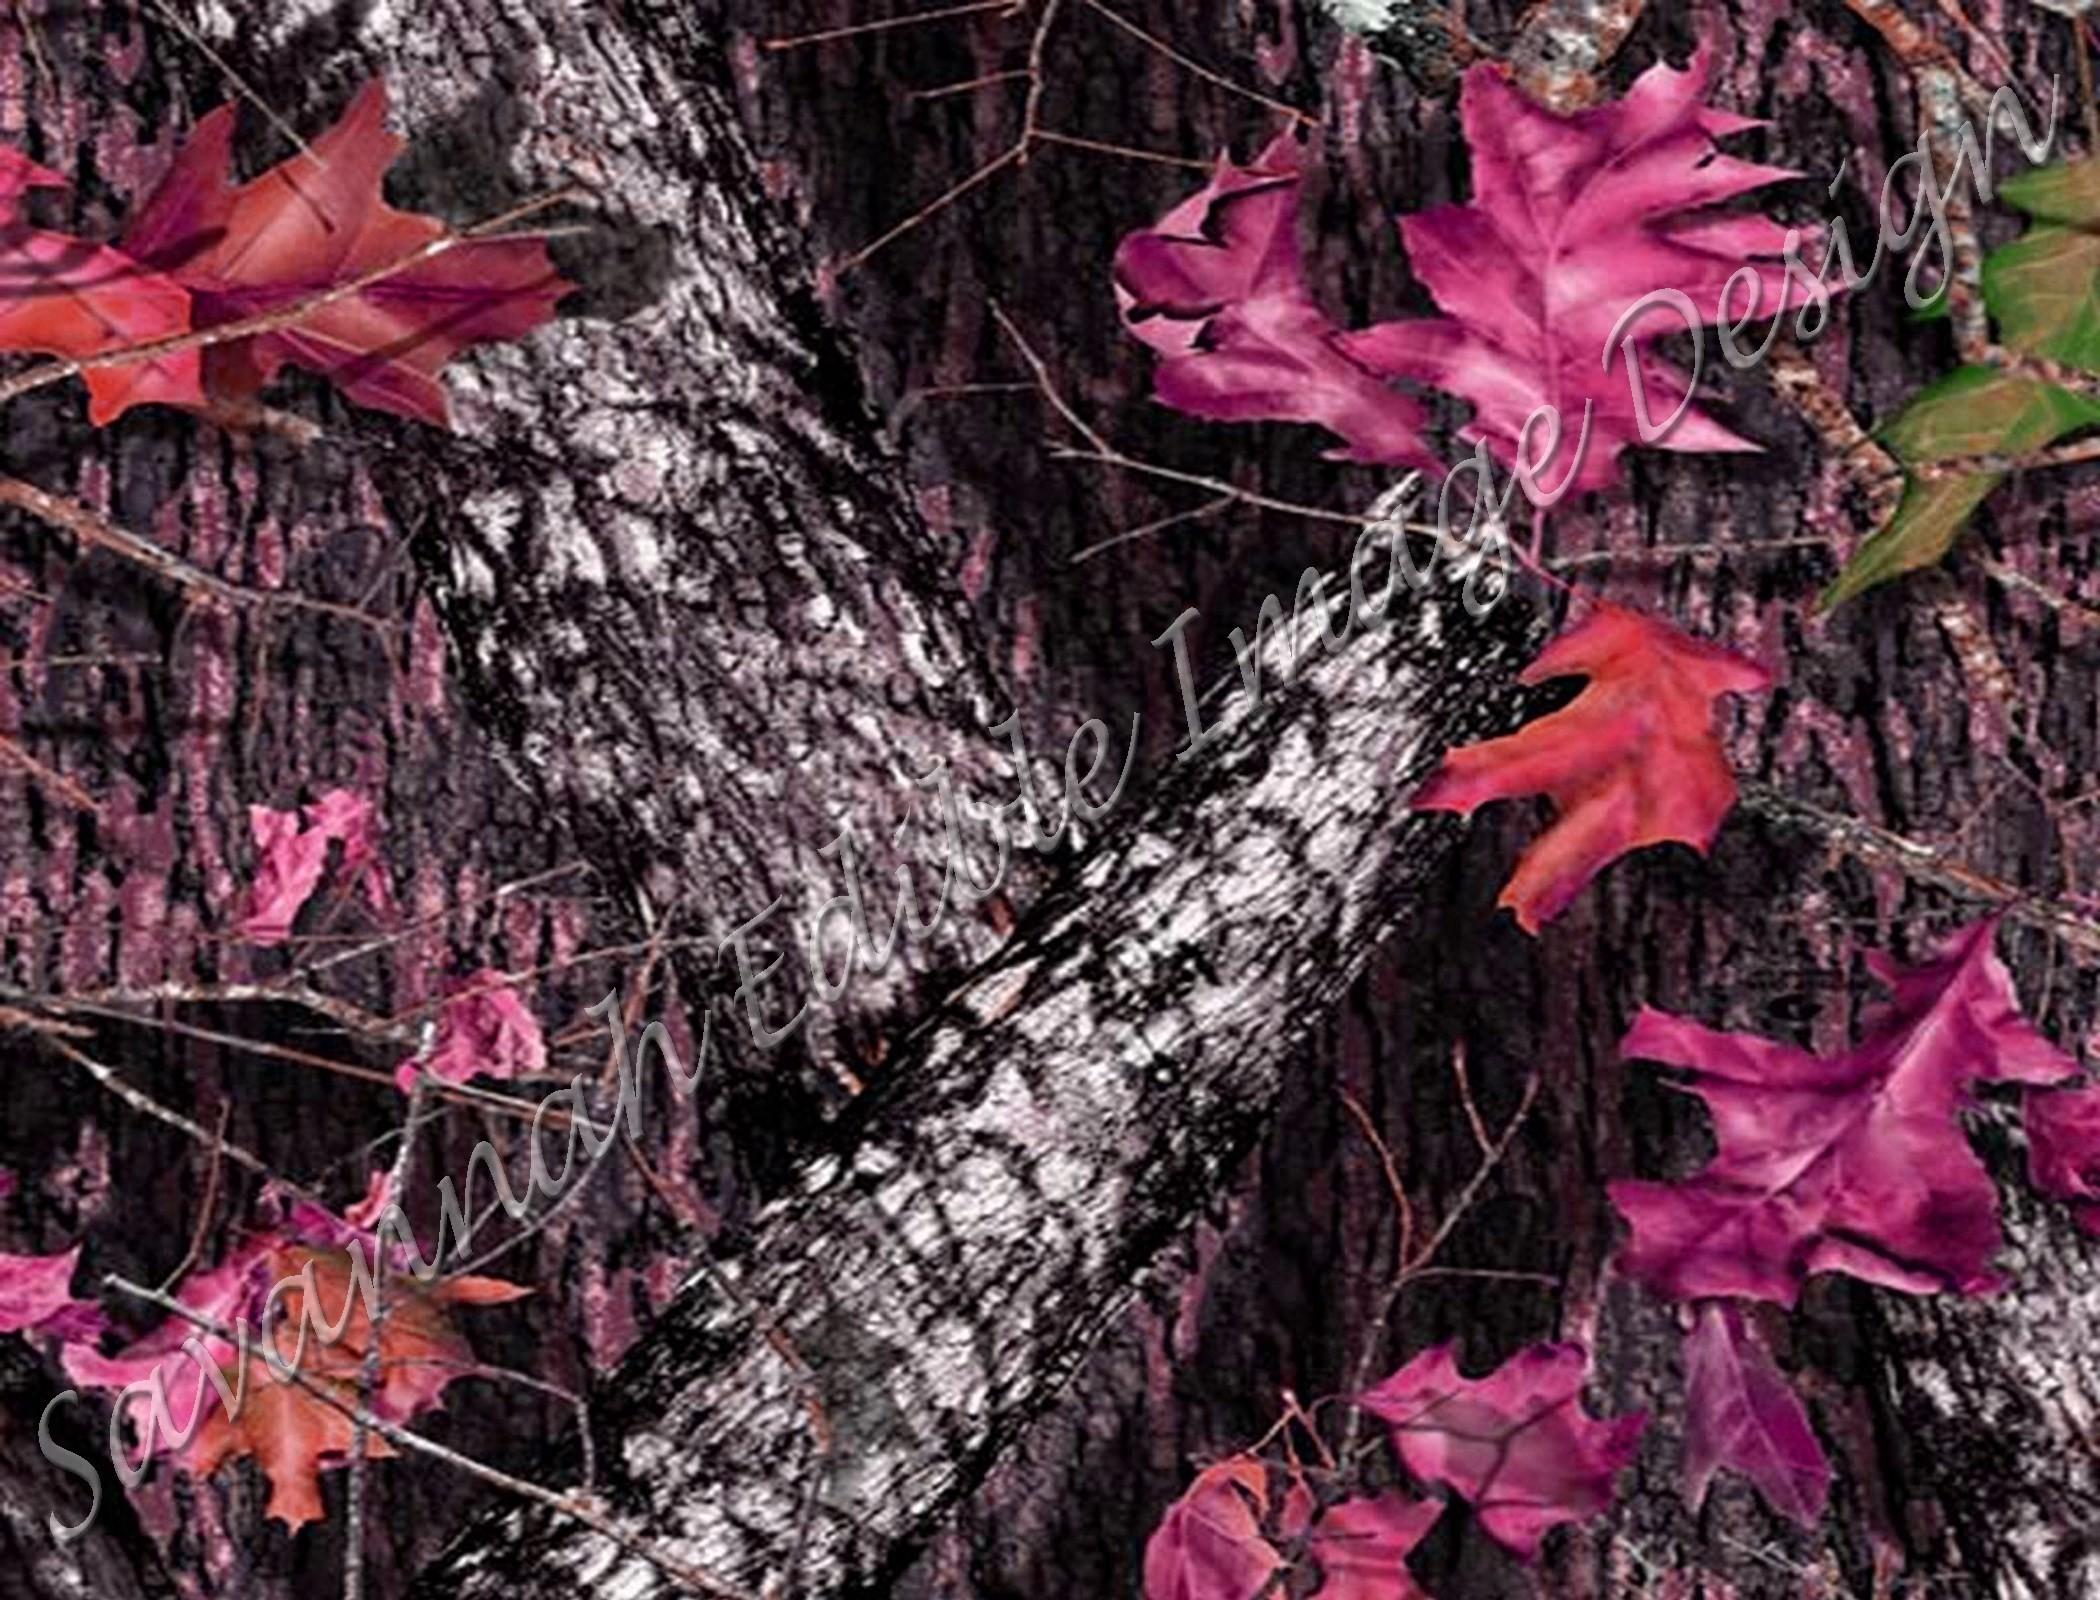 Mossy oak wallpapers wallpapertag - Pink camo iphone wallpaper ...